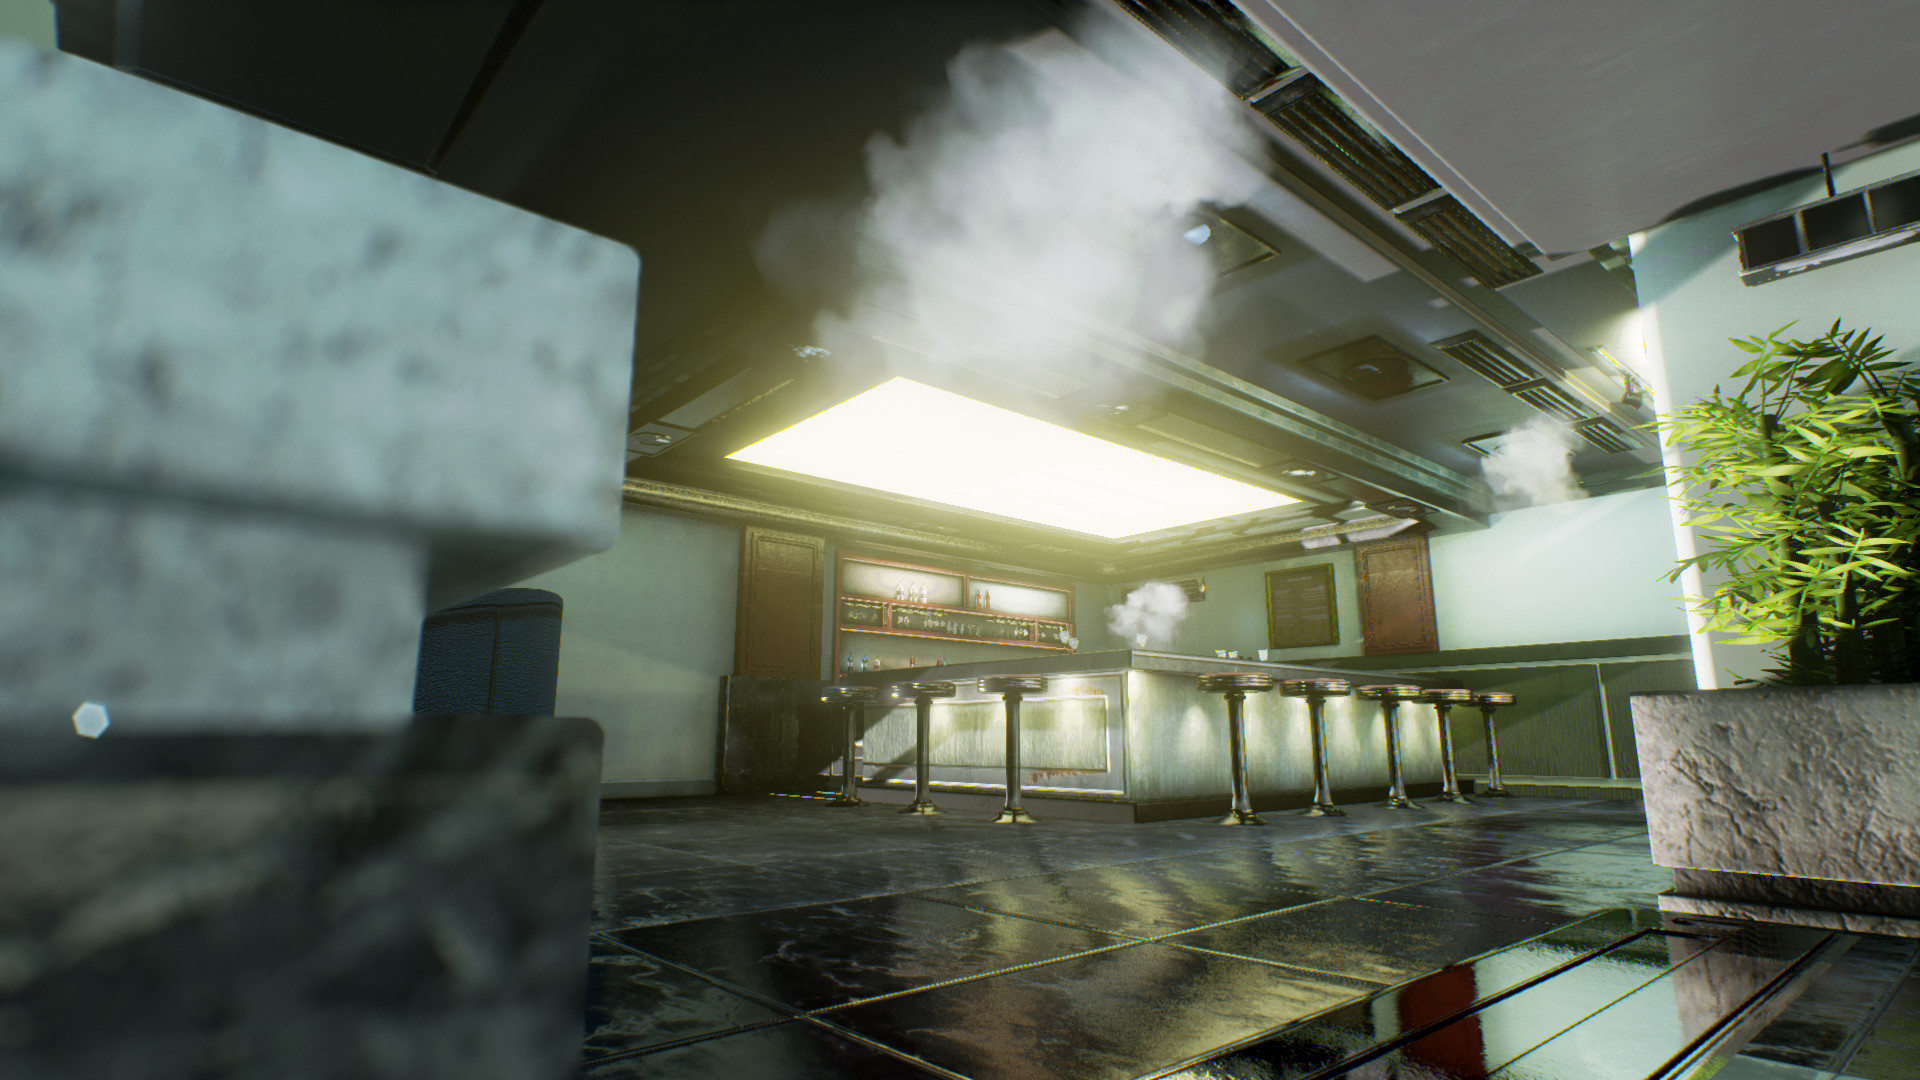 ArtStation - Metal Gear Solid 2, Tanker Lounge In Unreal